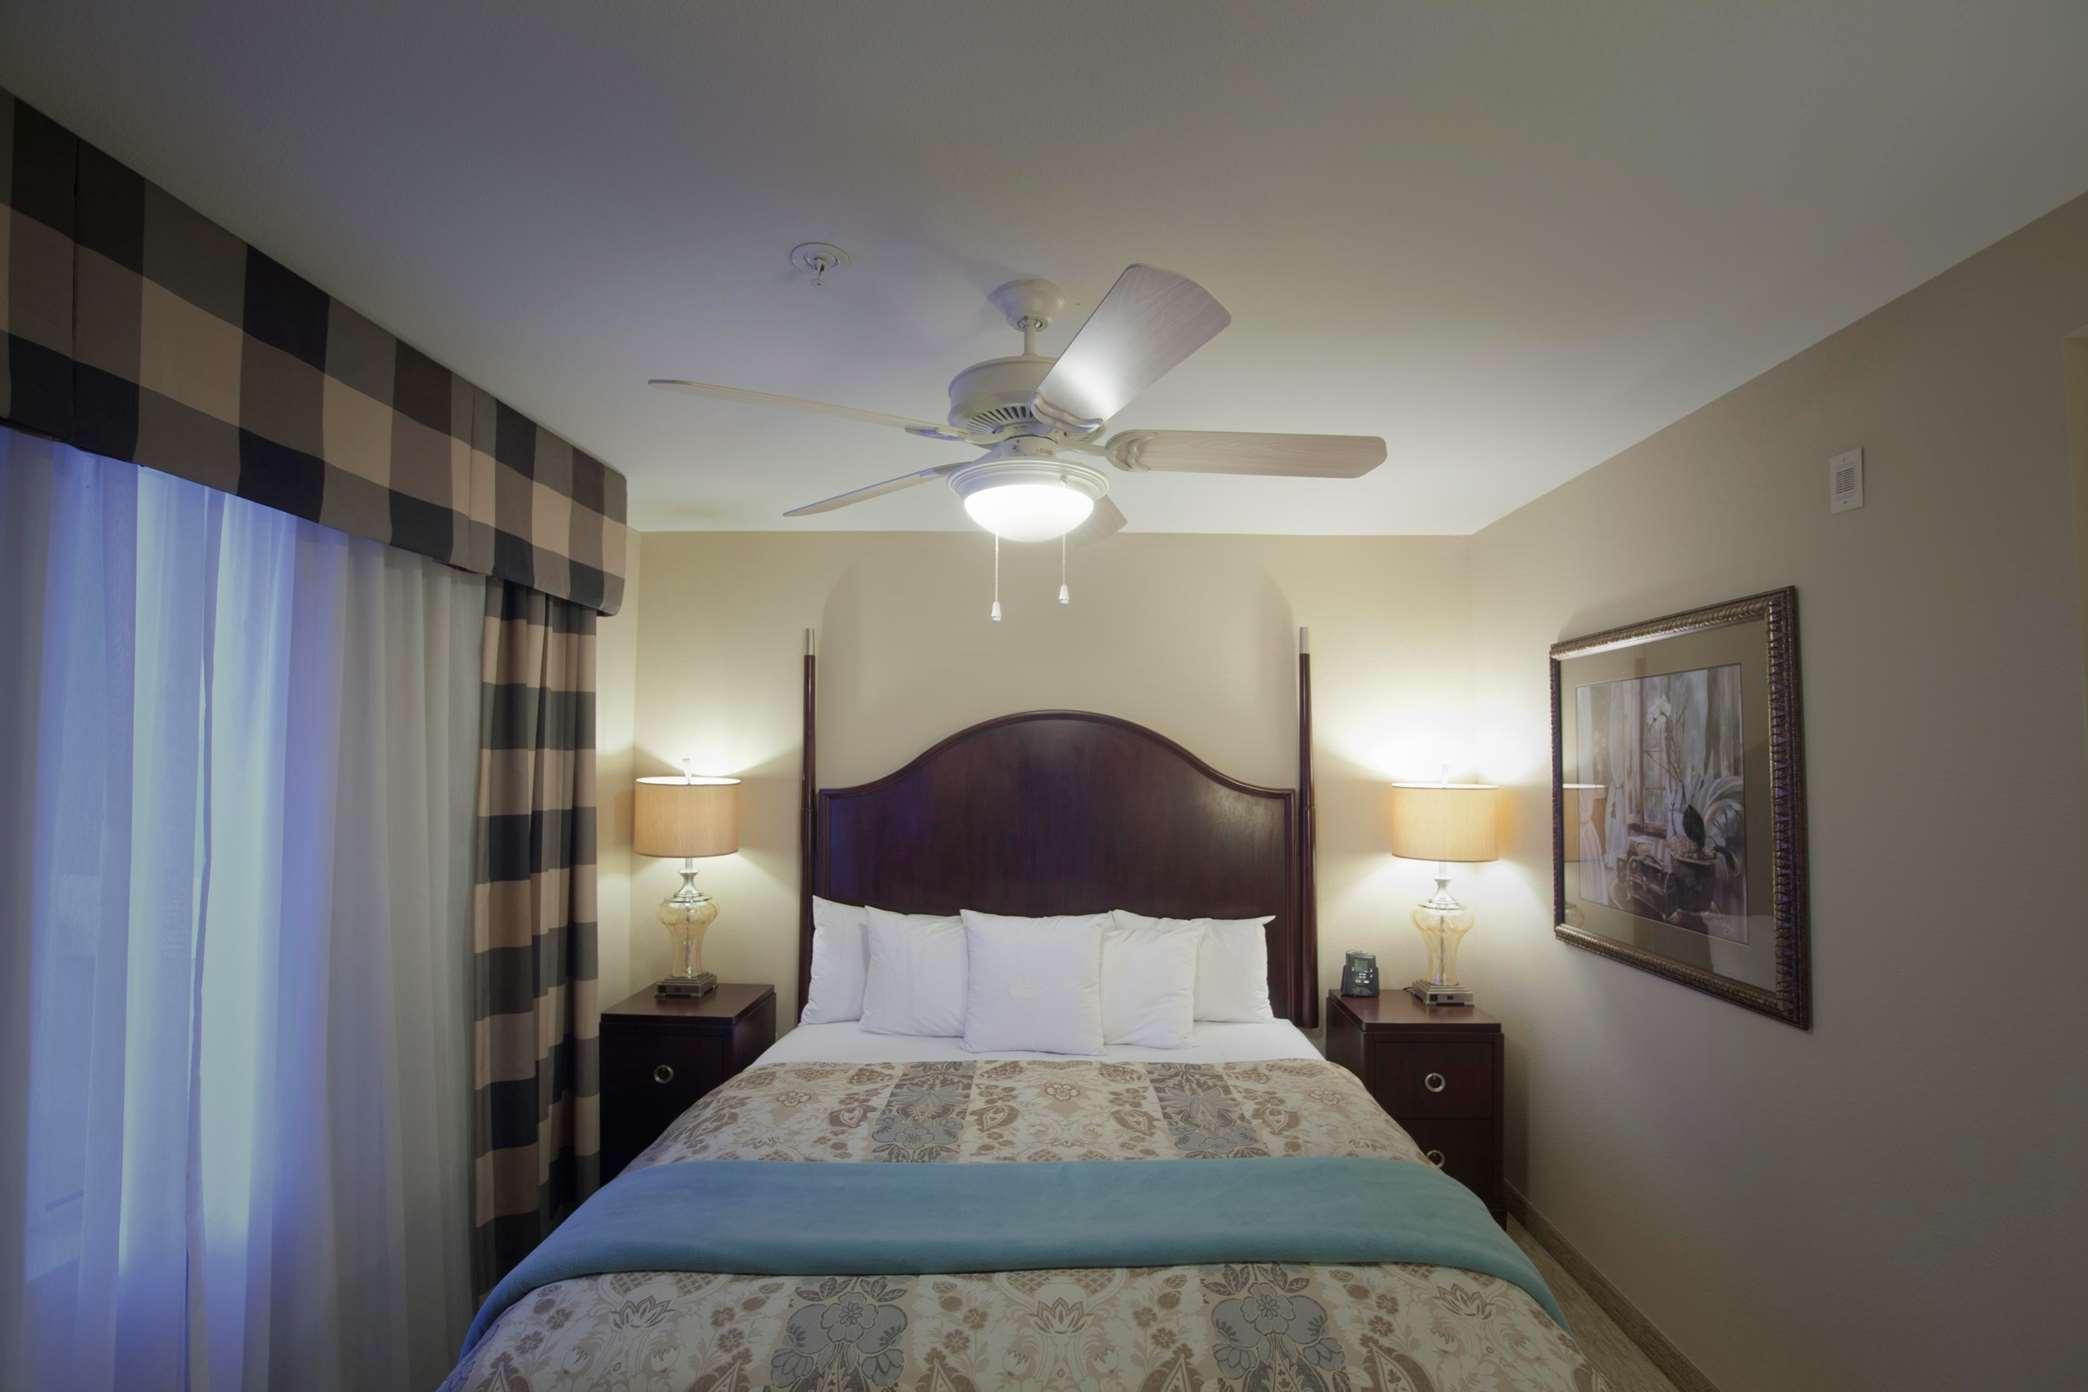 Homewood Suites by Hilton Albuquerque Airport image 11